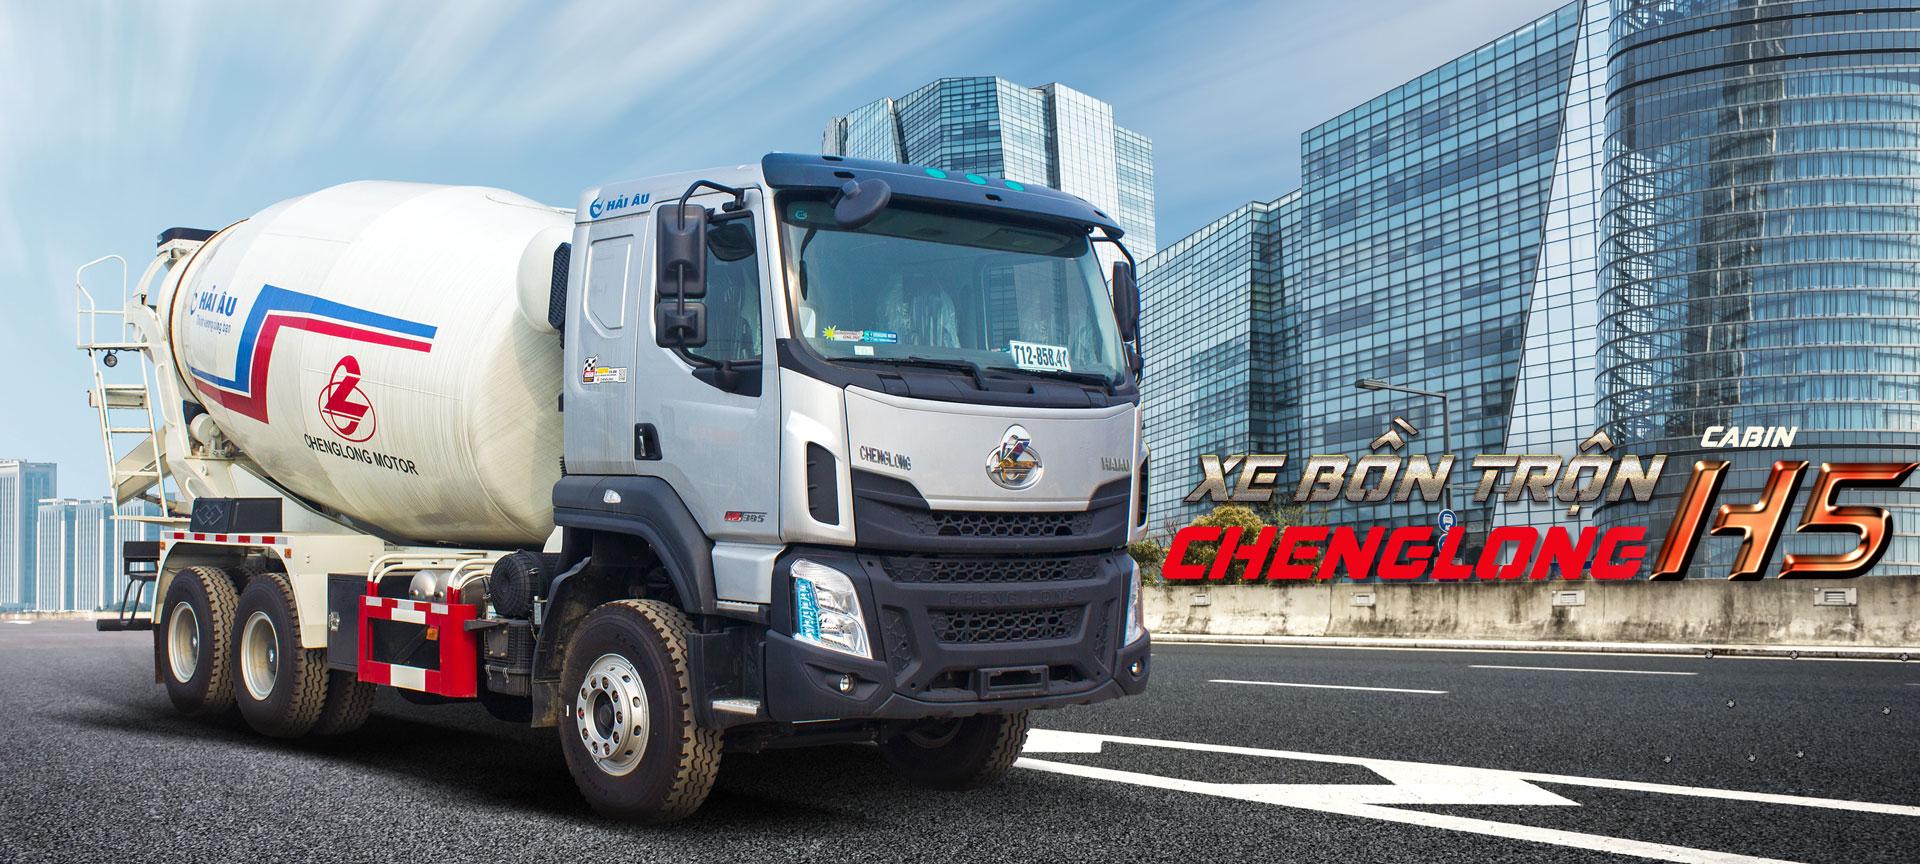 XE BỒN TRỘN CHENGLONG H5 350HP